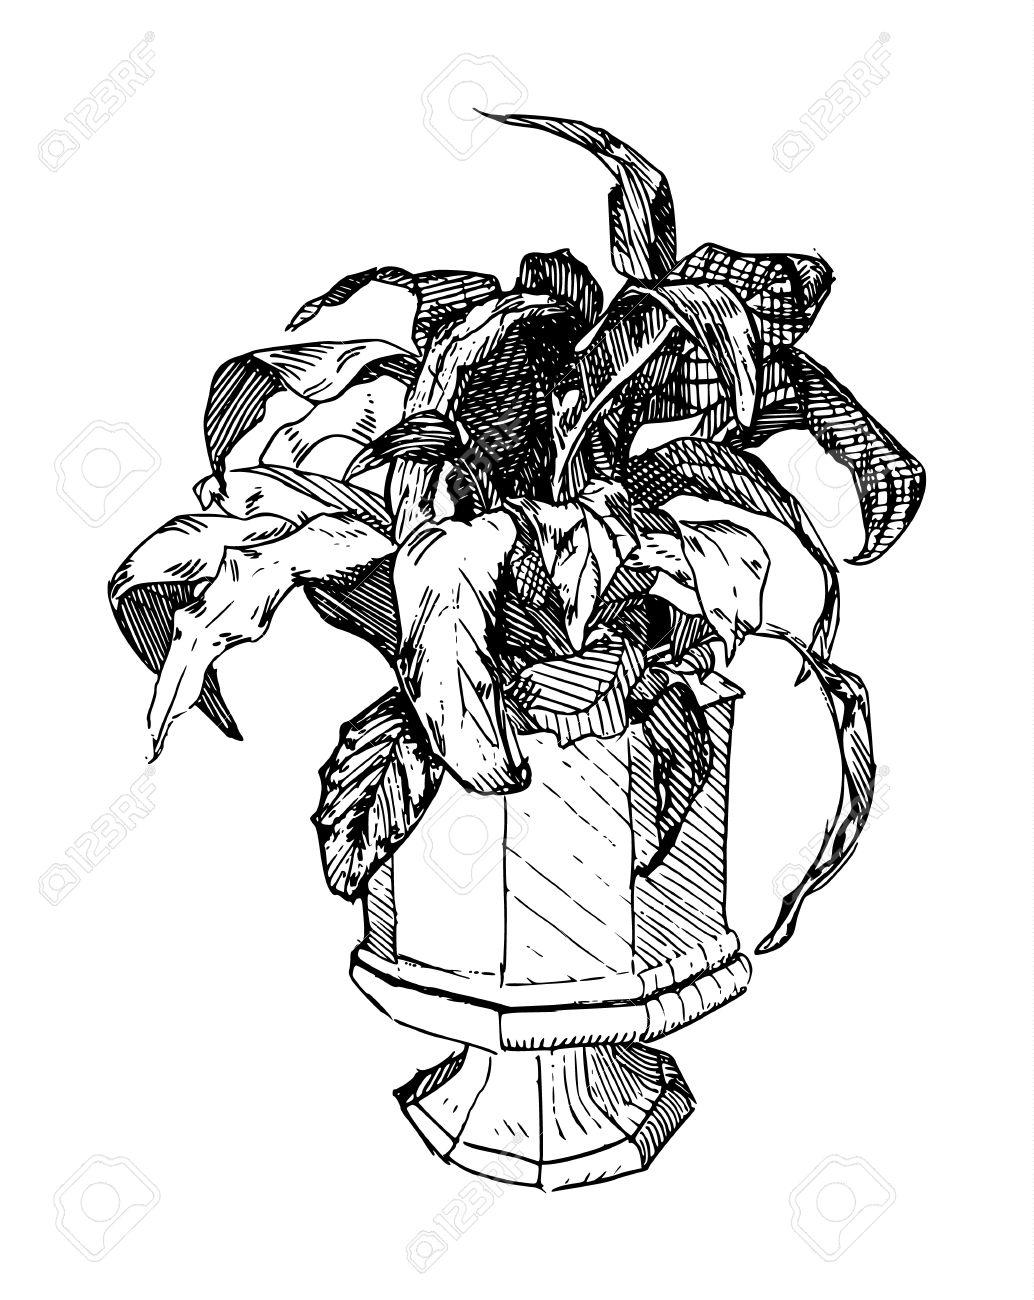 Line Art Illustration Of A Potted Plant In Albrecht Durer Style.